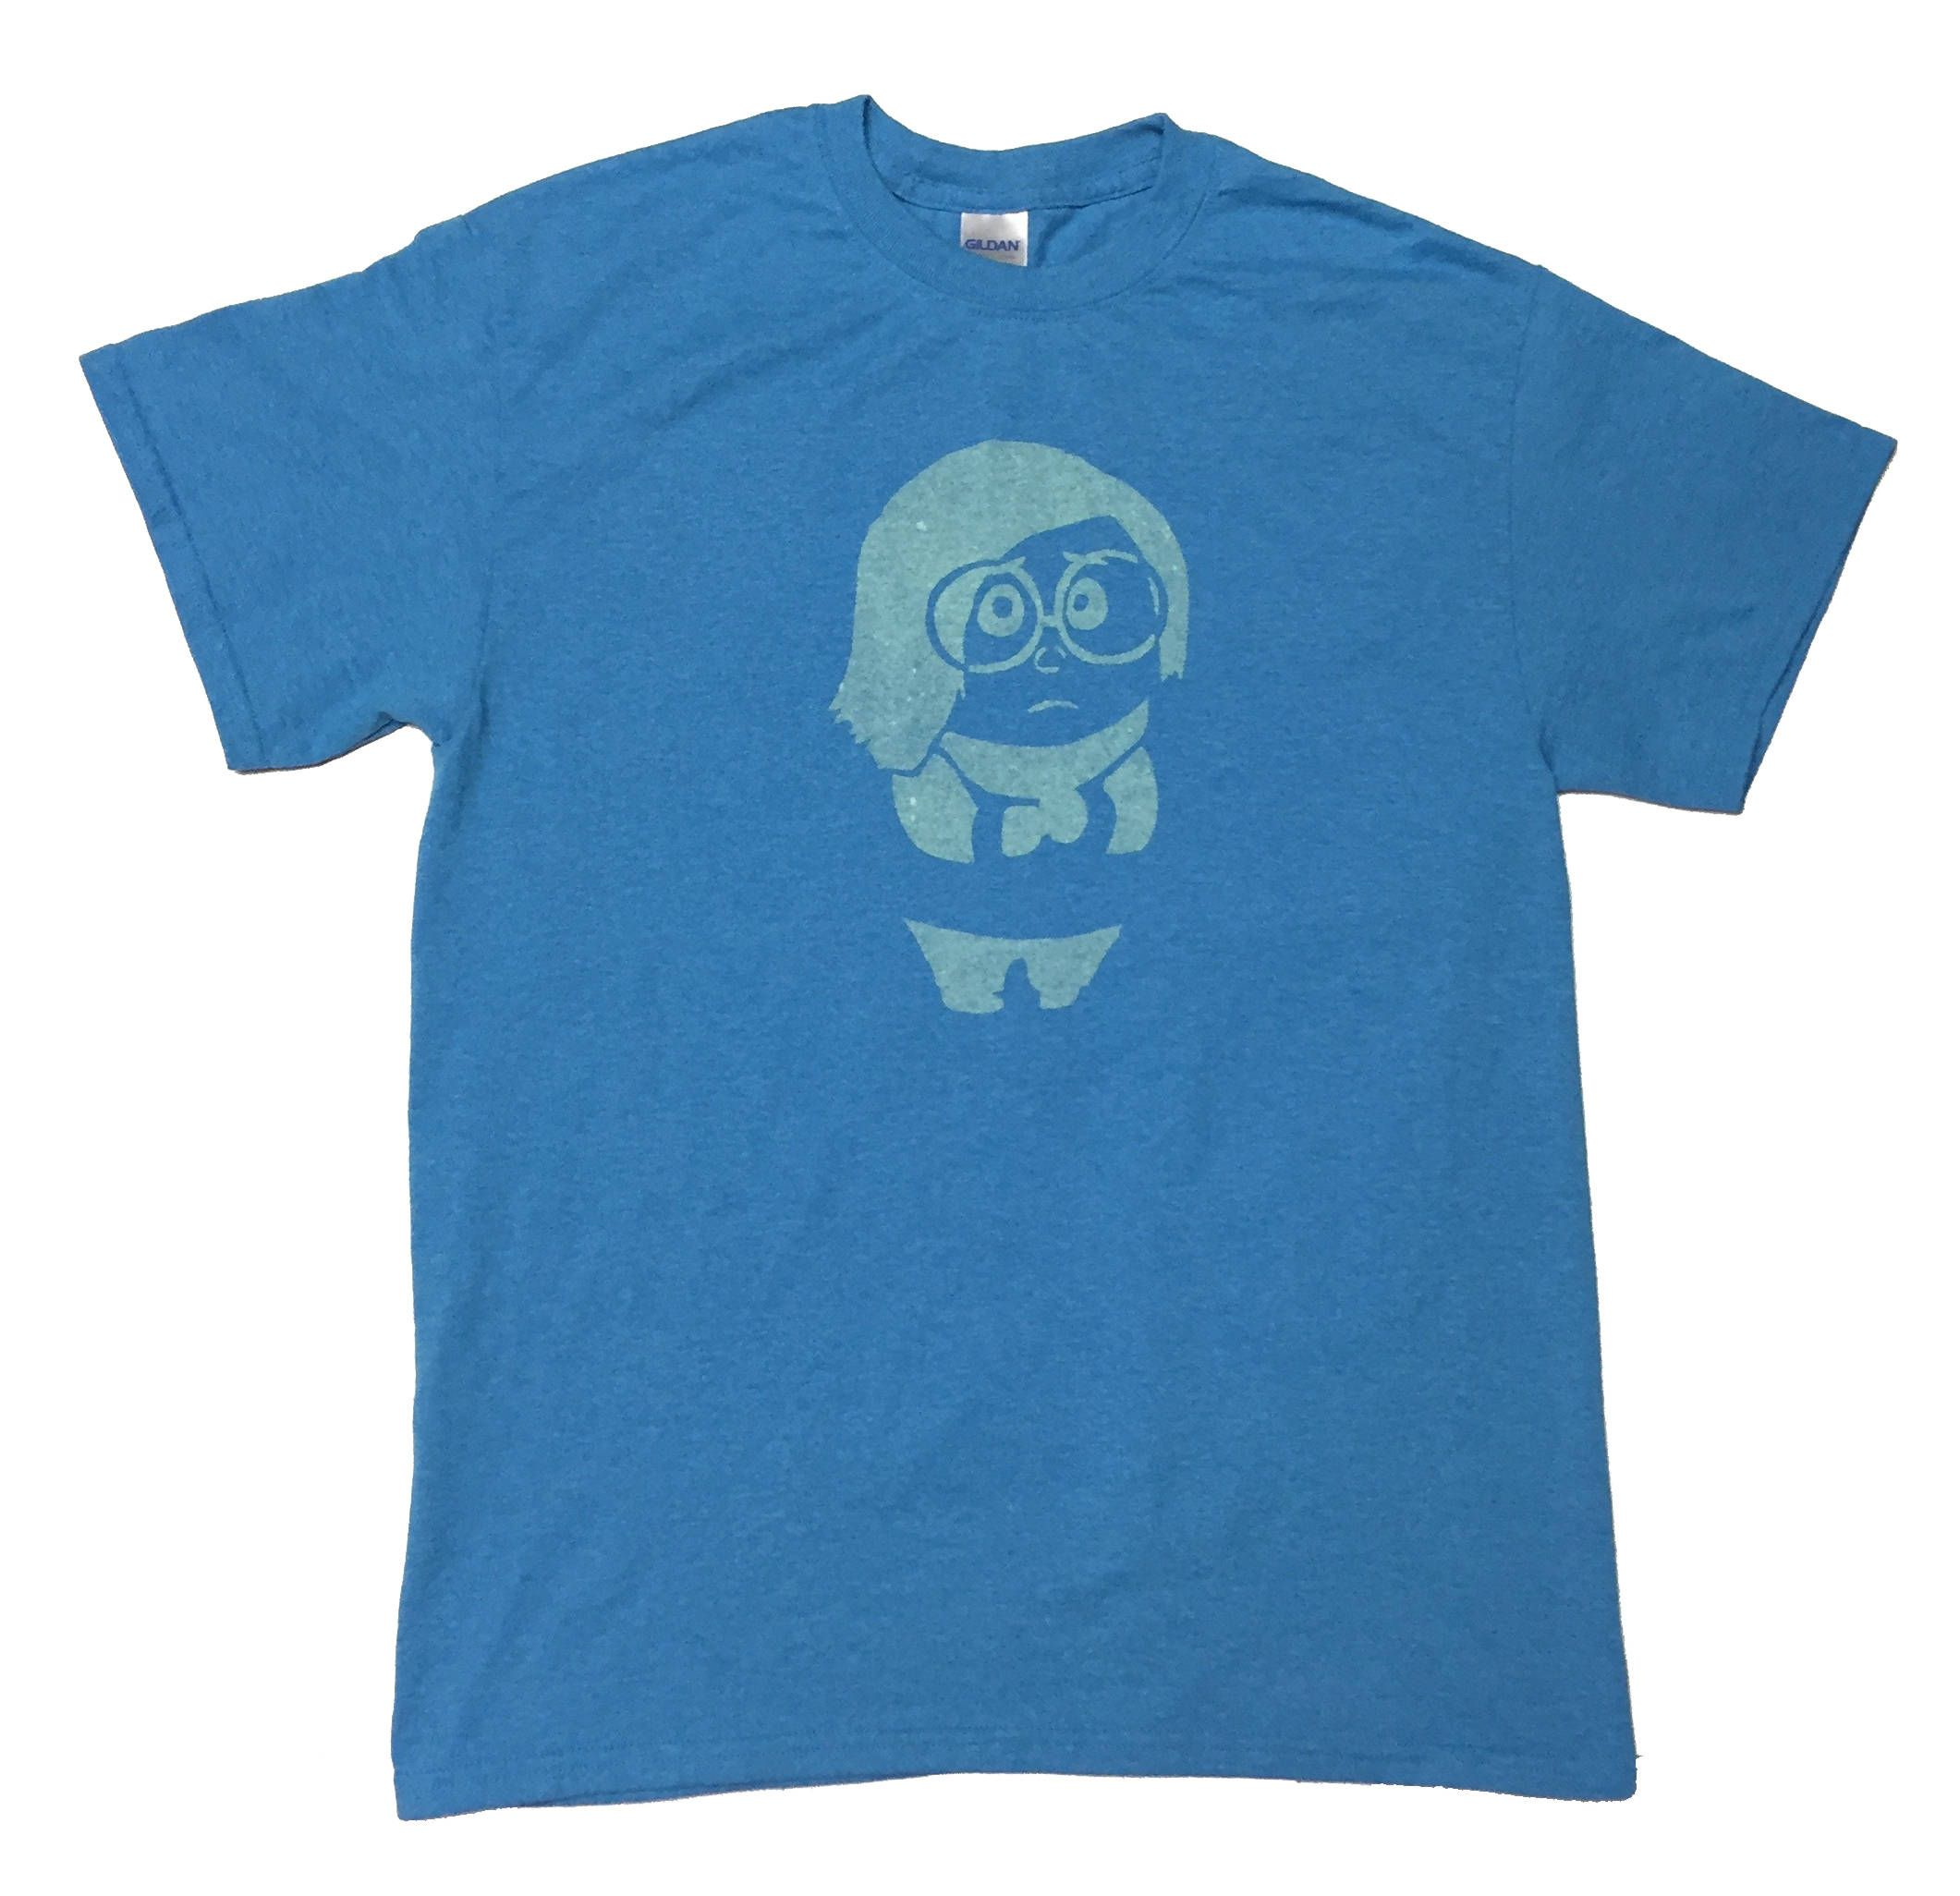 Sadness Disney Shirt Inside Out Anger Vacation Shirt